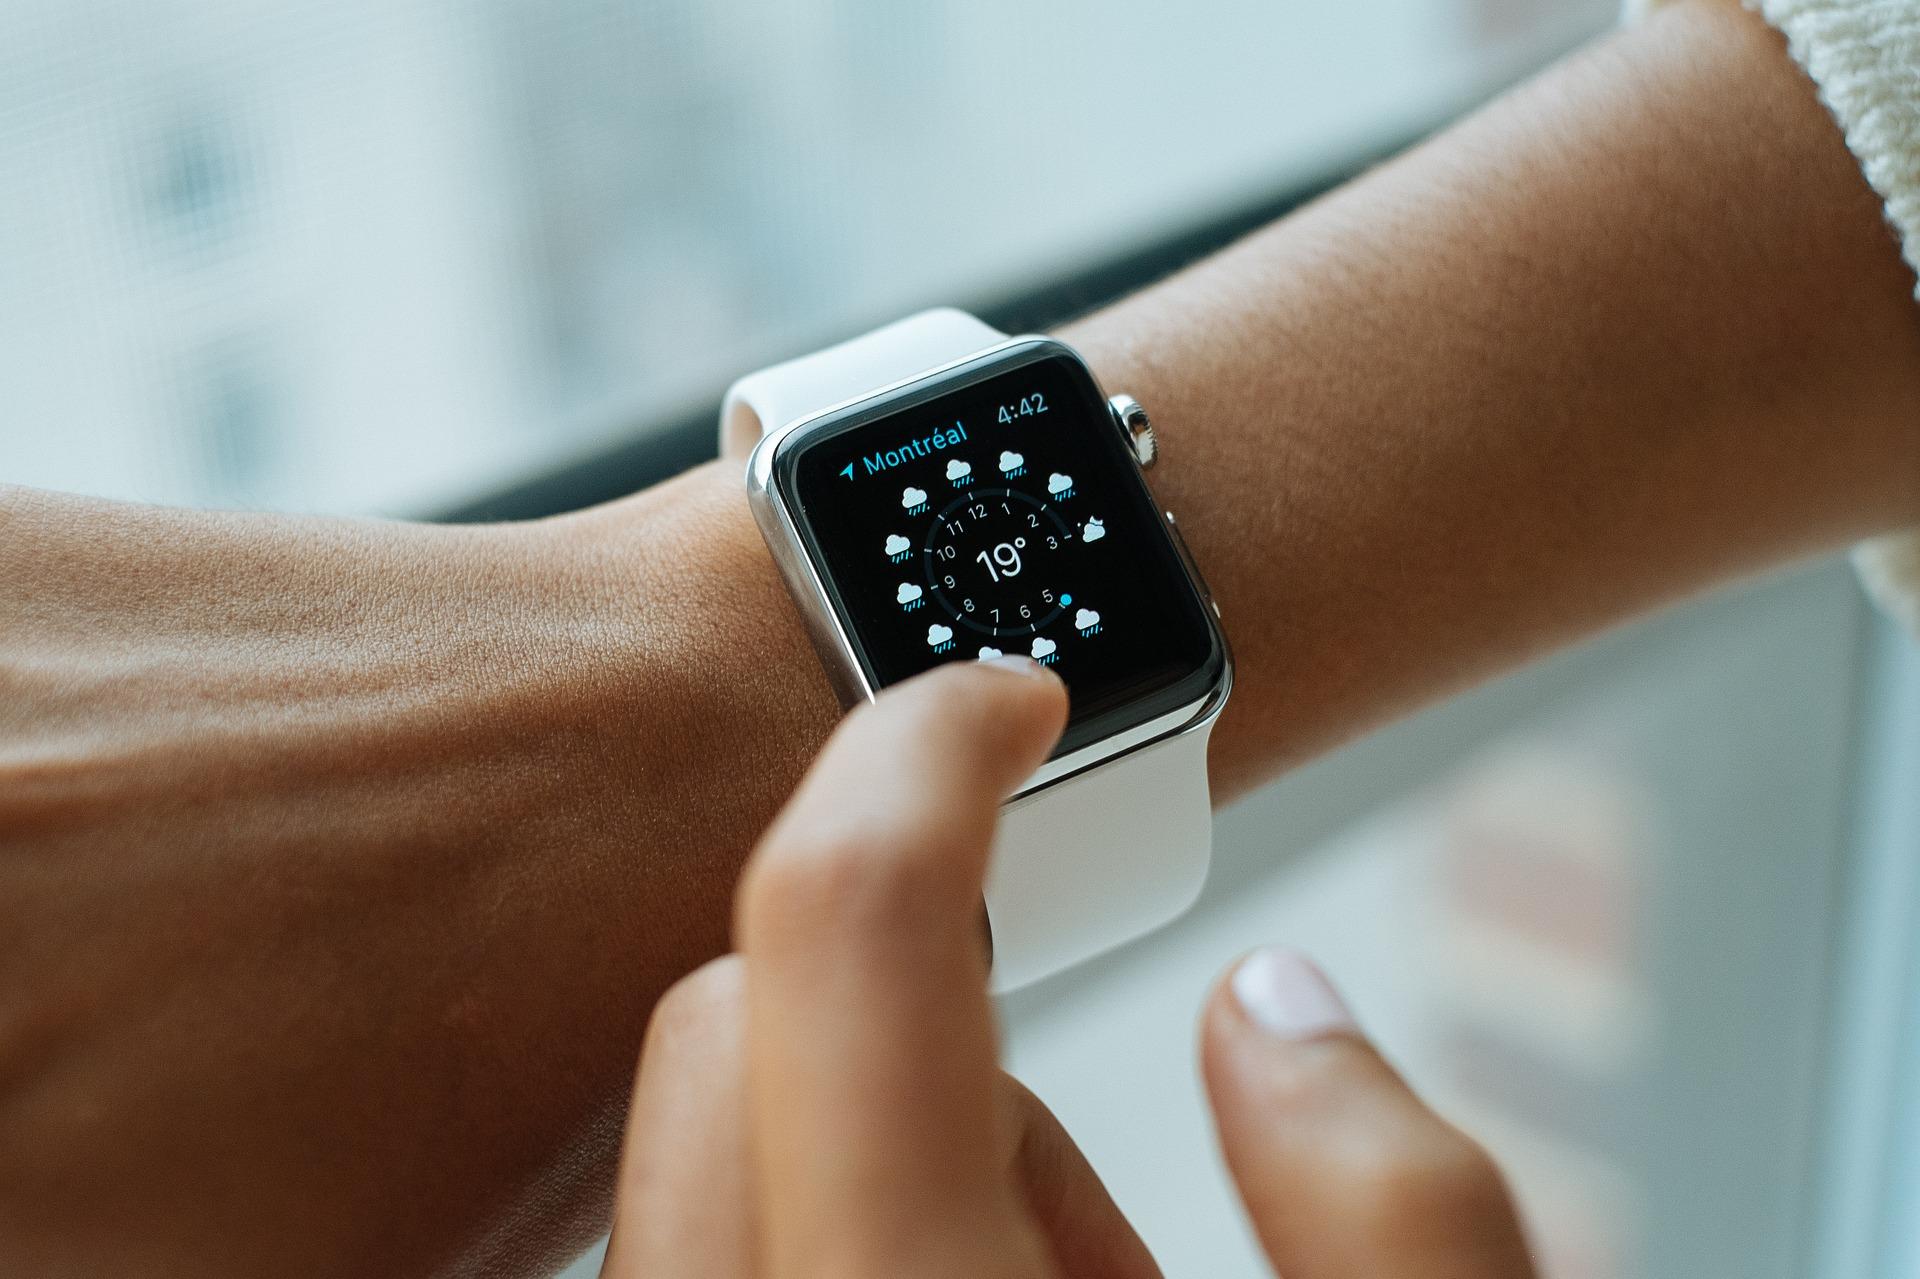 smart-watch-821557_1920